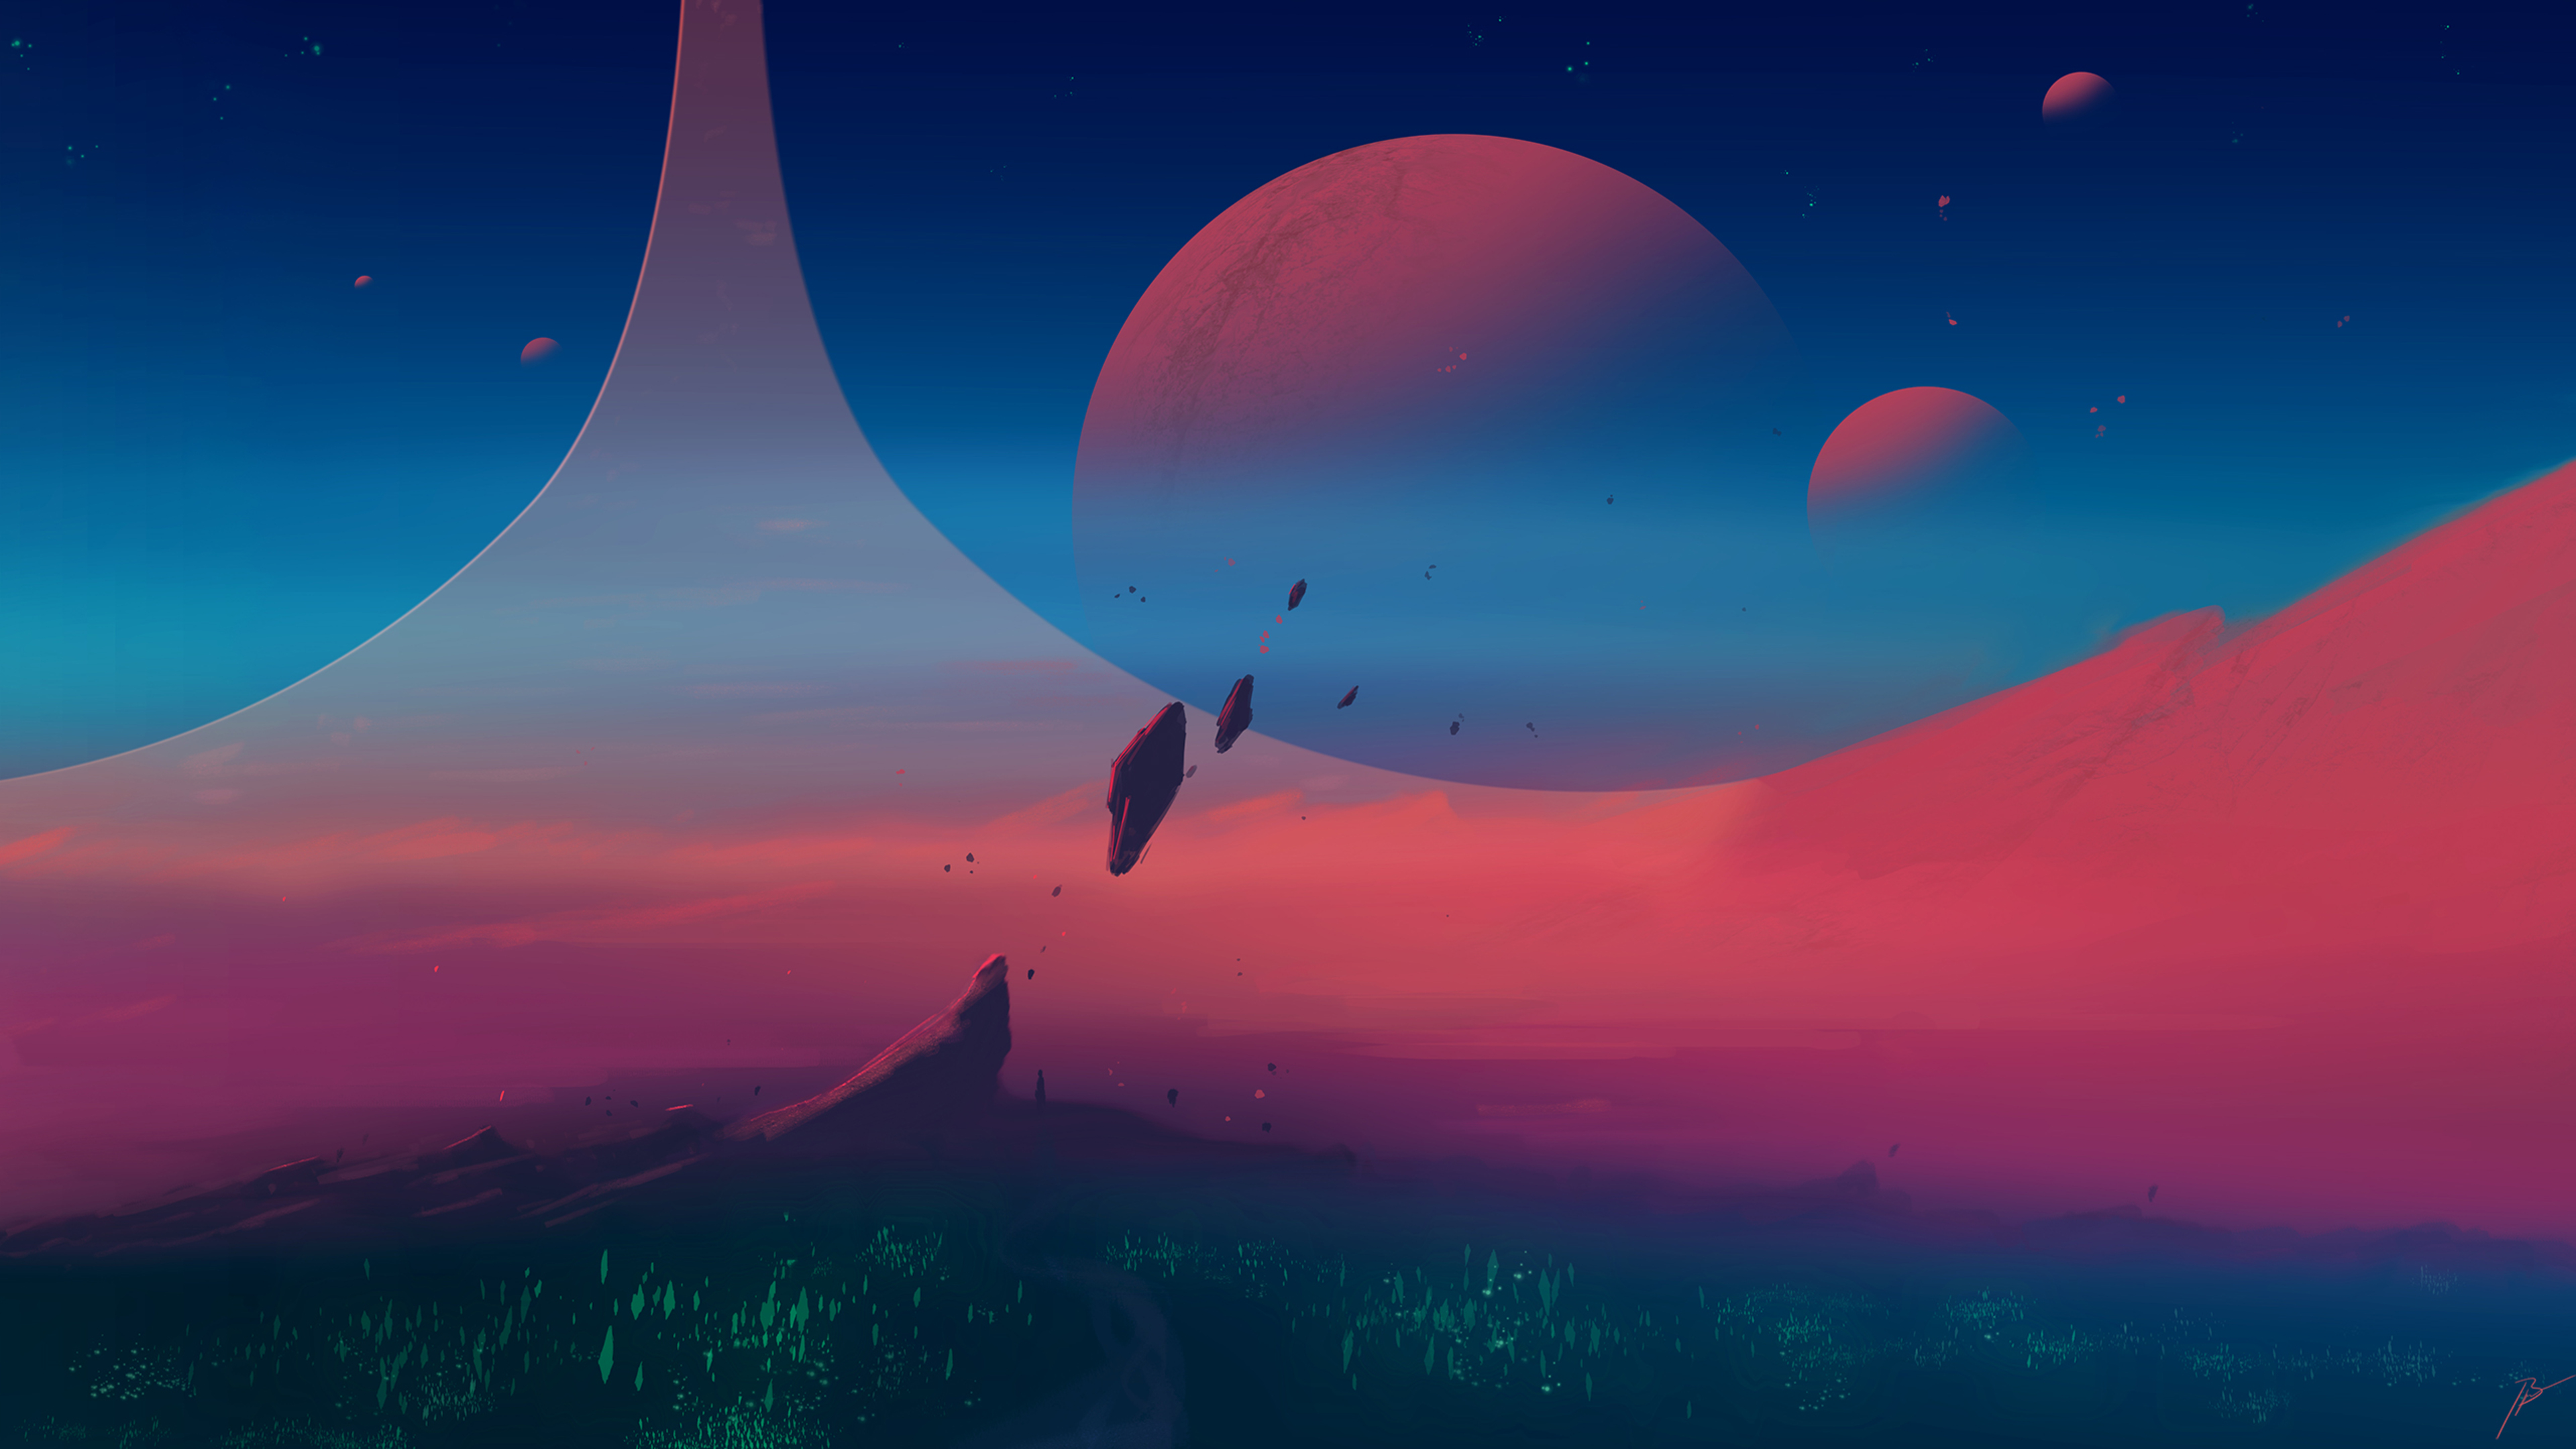 digital-art-planet-world-0p.jpg